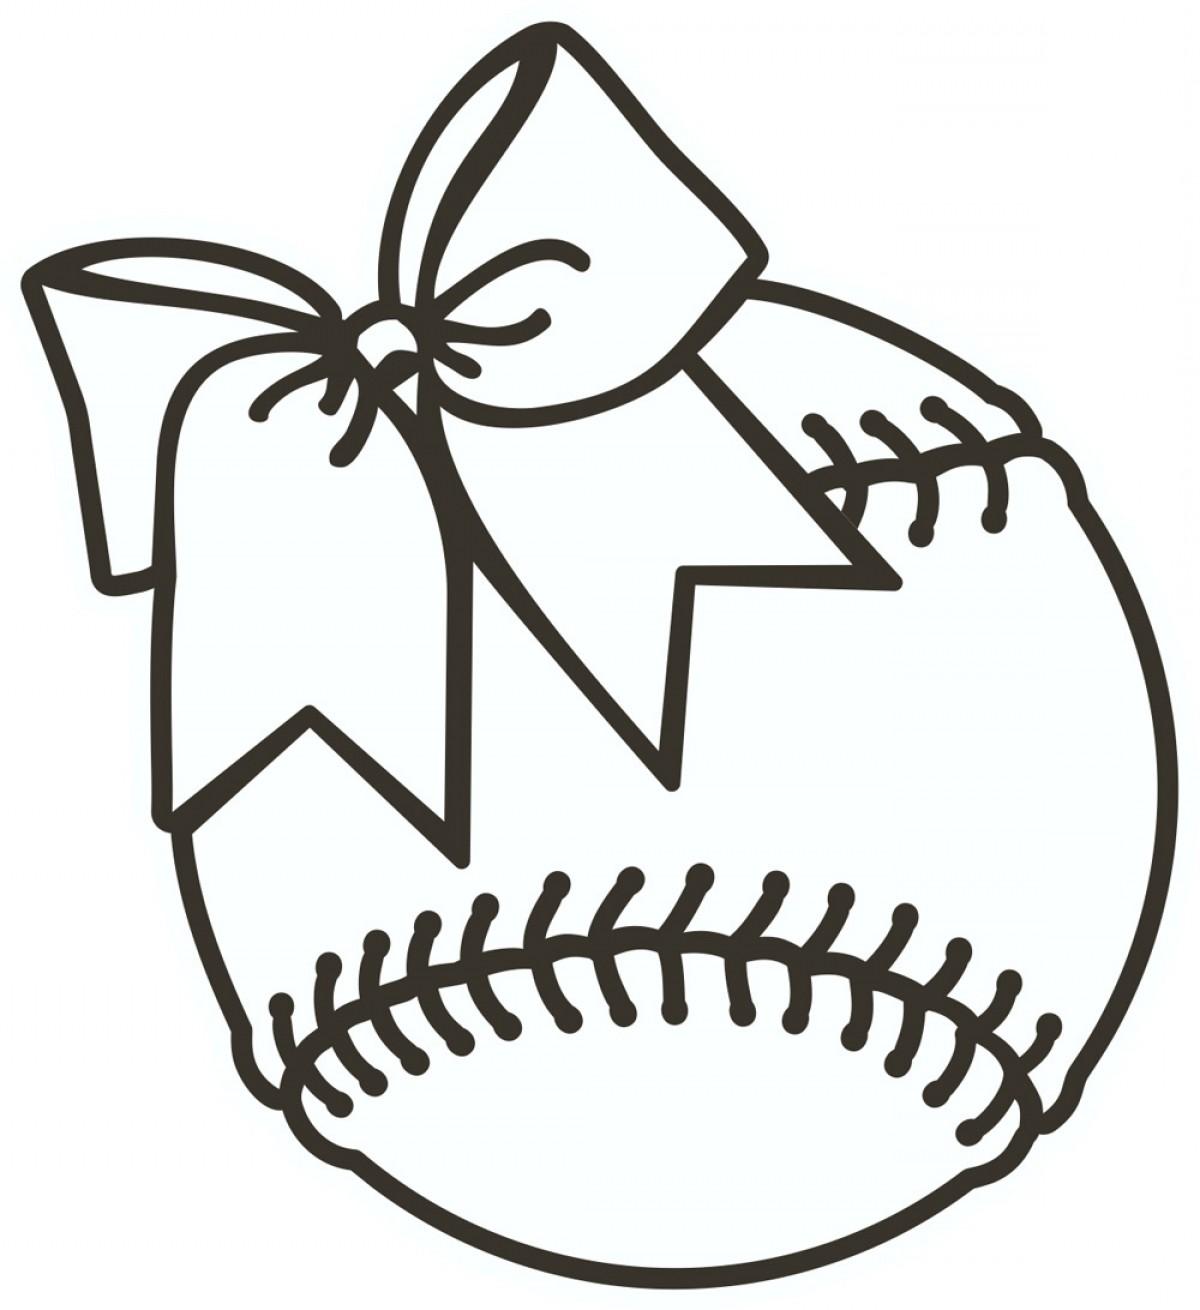 Softball Clipart Black And White Softball Clip Art.